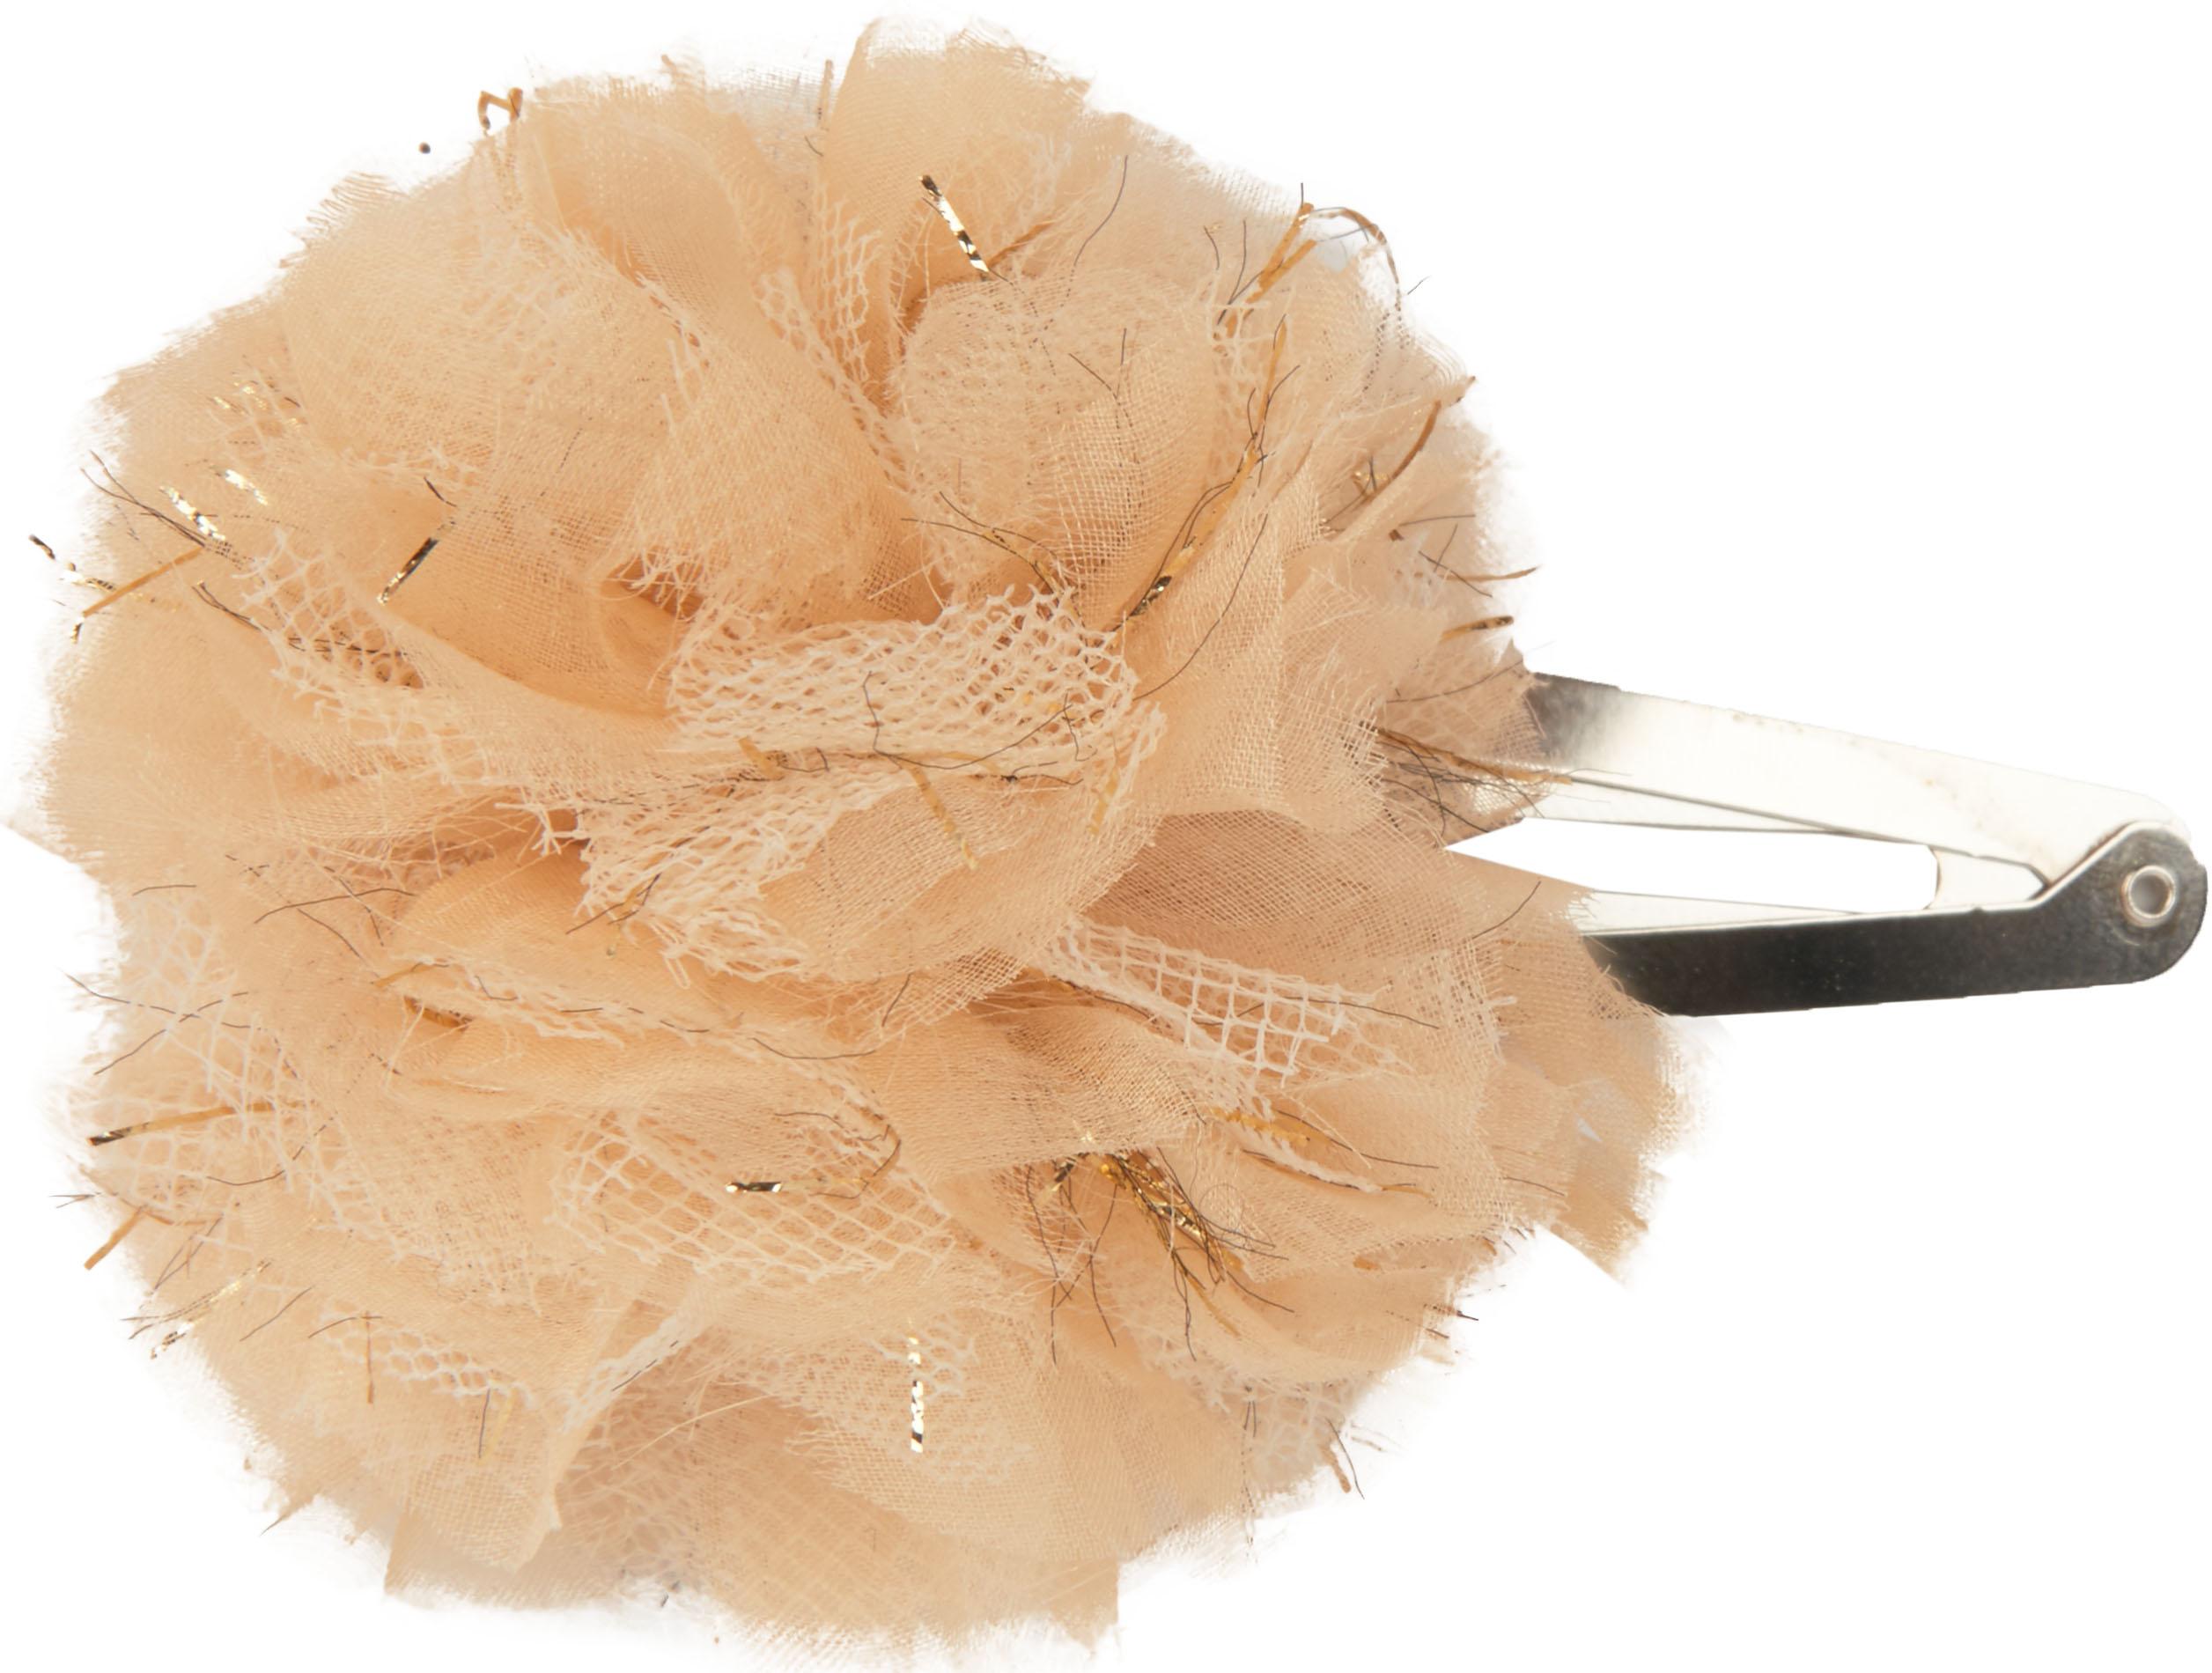 Trouva Woodstock Prince Pom Hair Clip : 0b79186c 16a0 482c a611 3671a438b097 from www.trouva.com size 2512 x 1900 jpeg 439kB